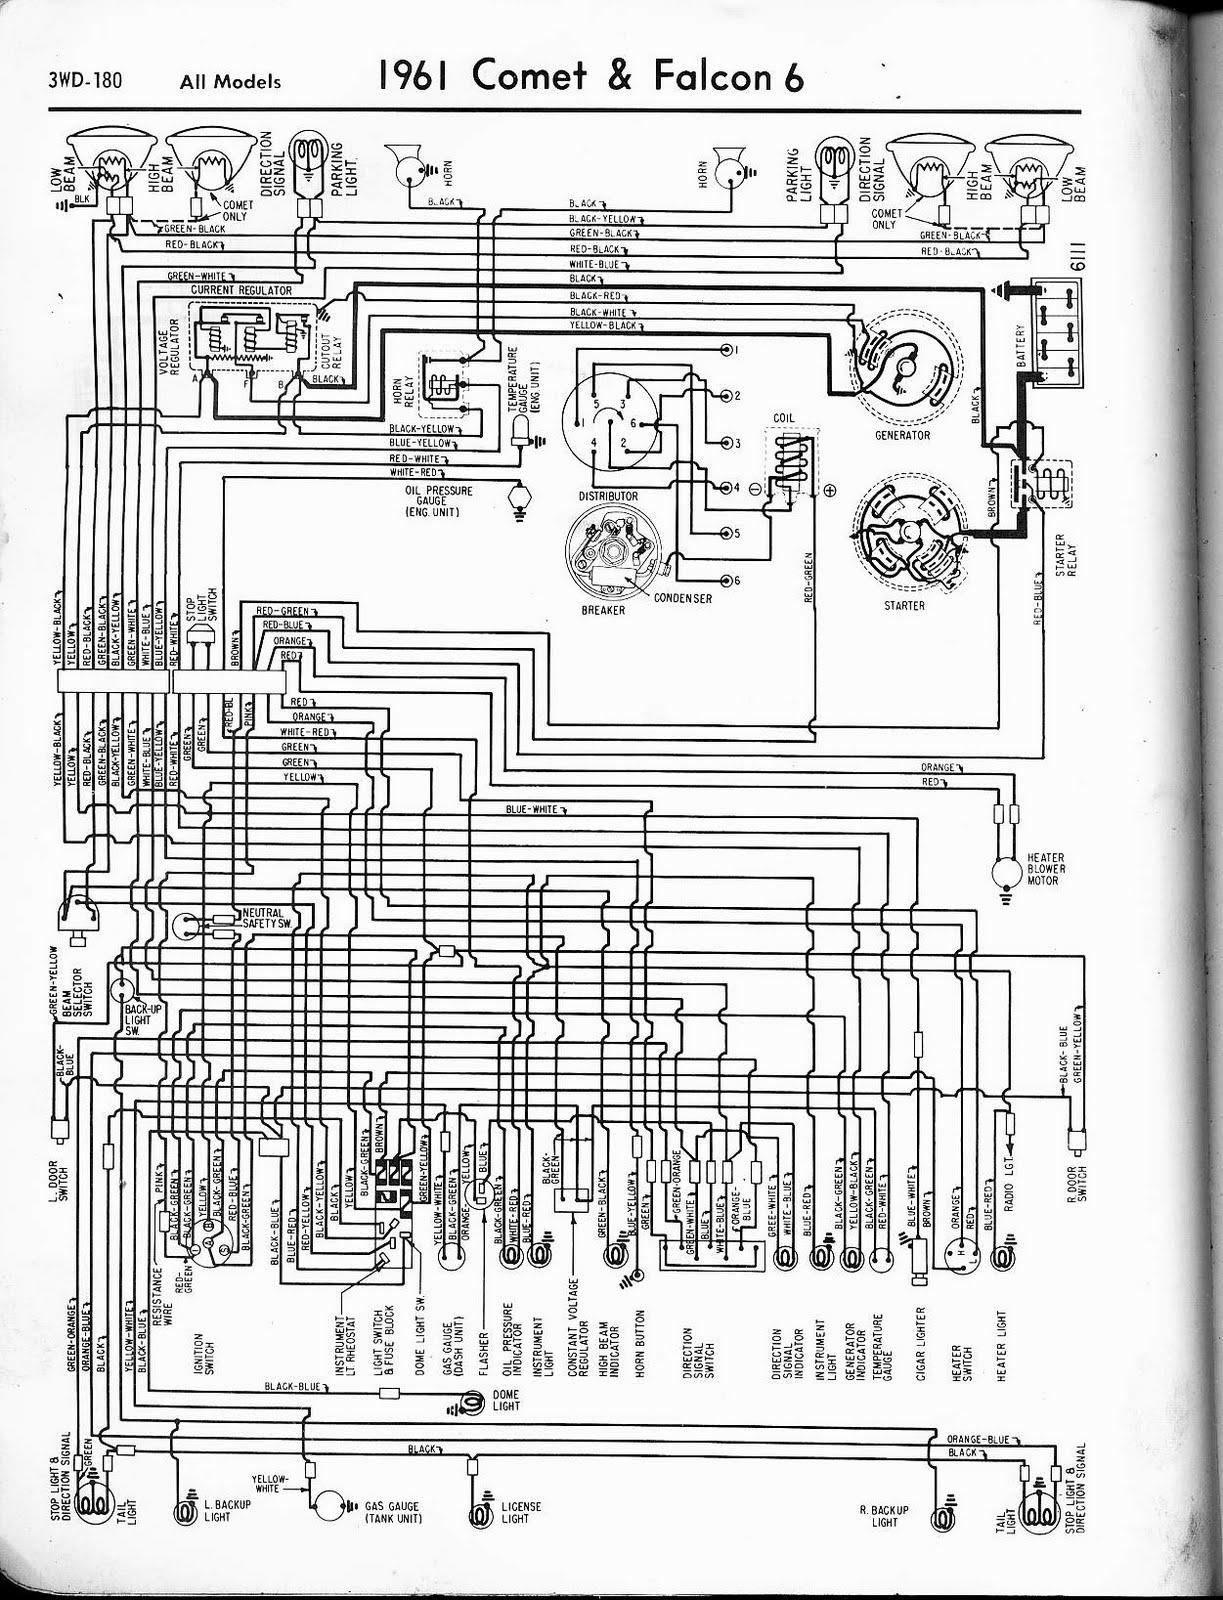 1978 Ford Ranchero Wiring Diagram Library 78 Fuel Gauge Voltage Regulator 1223x1600